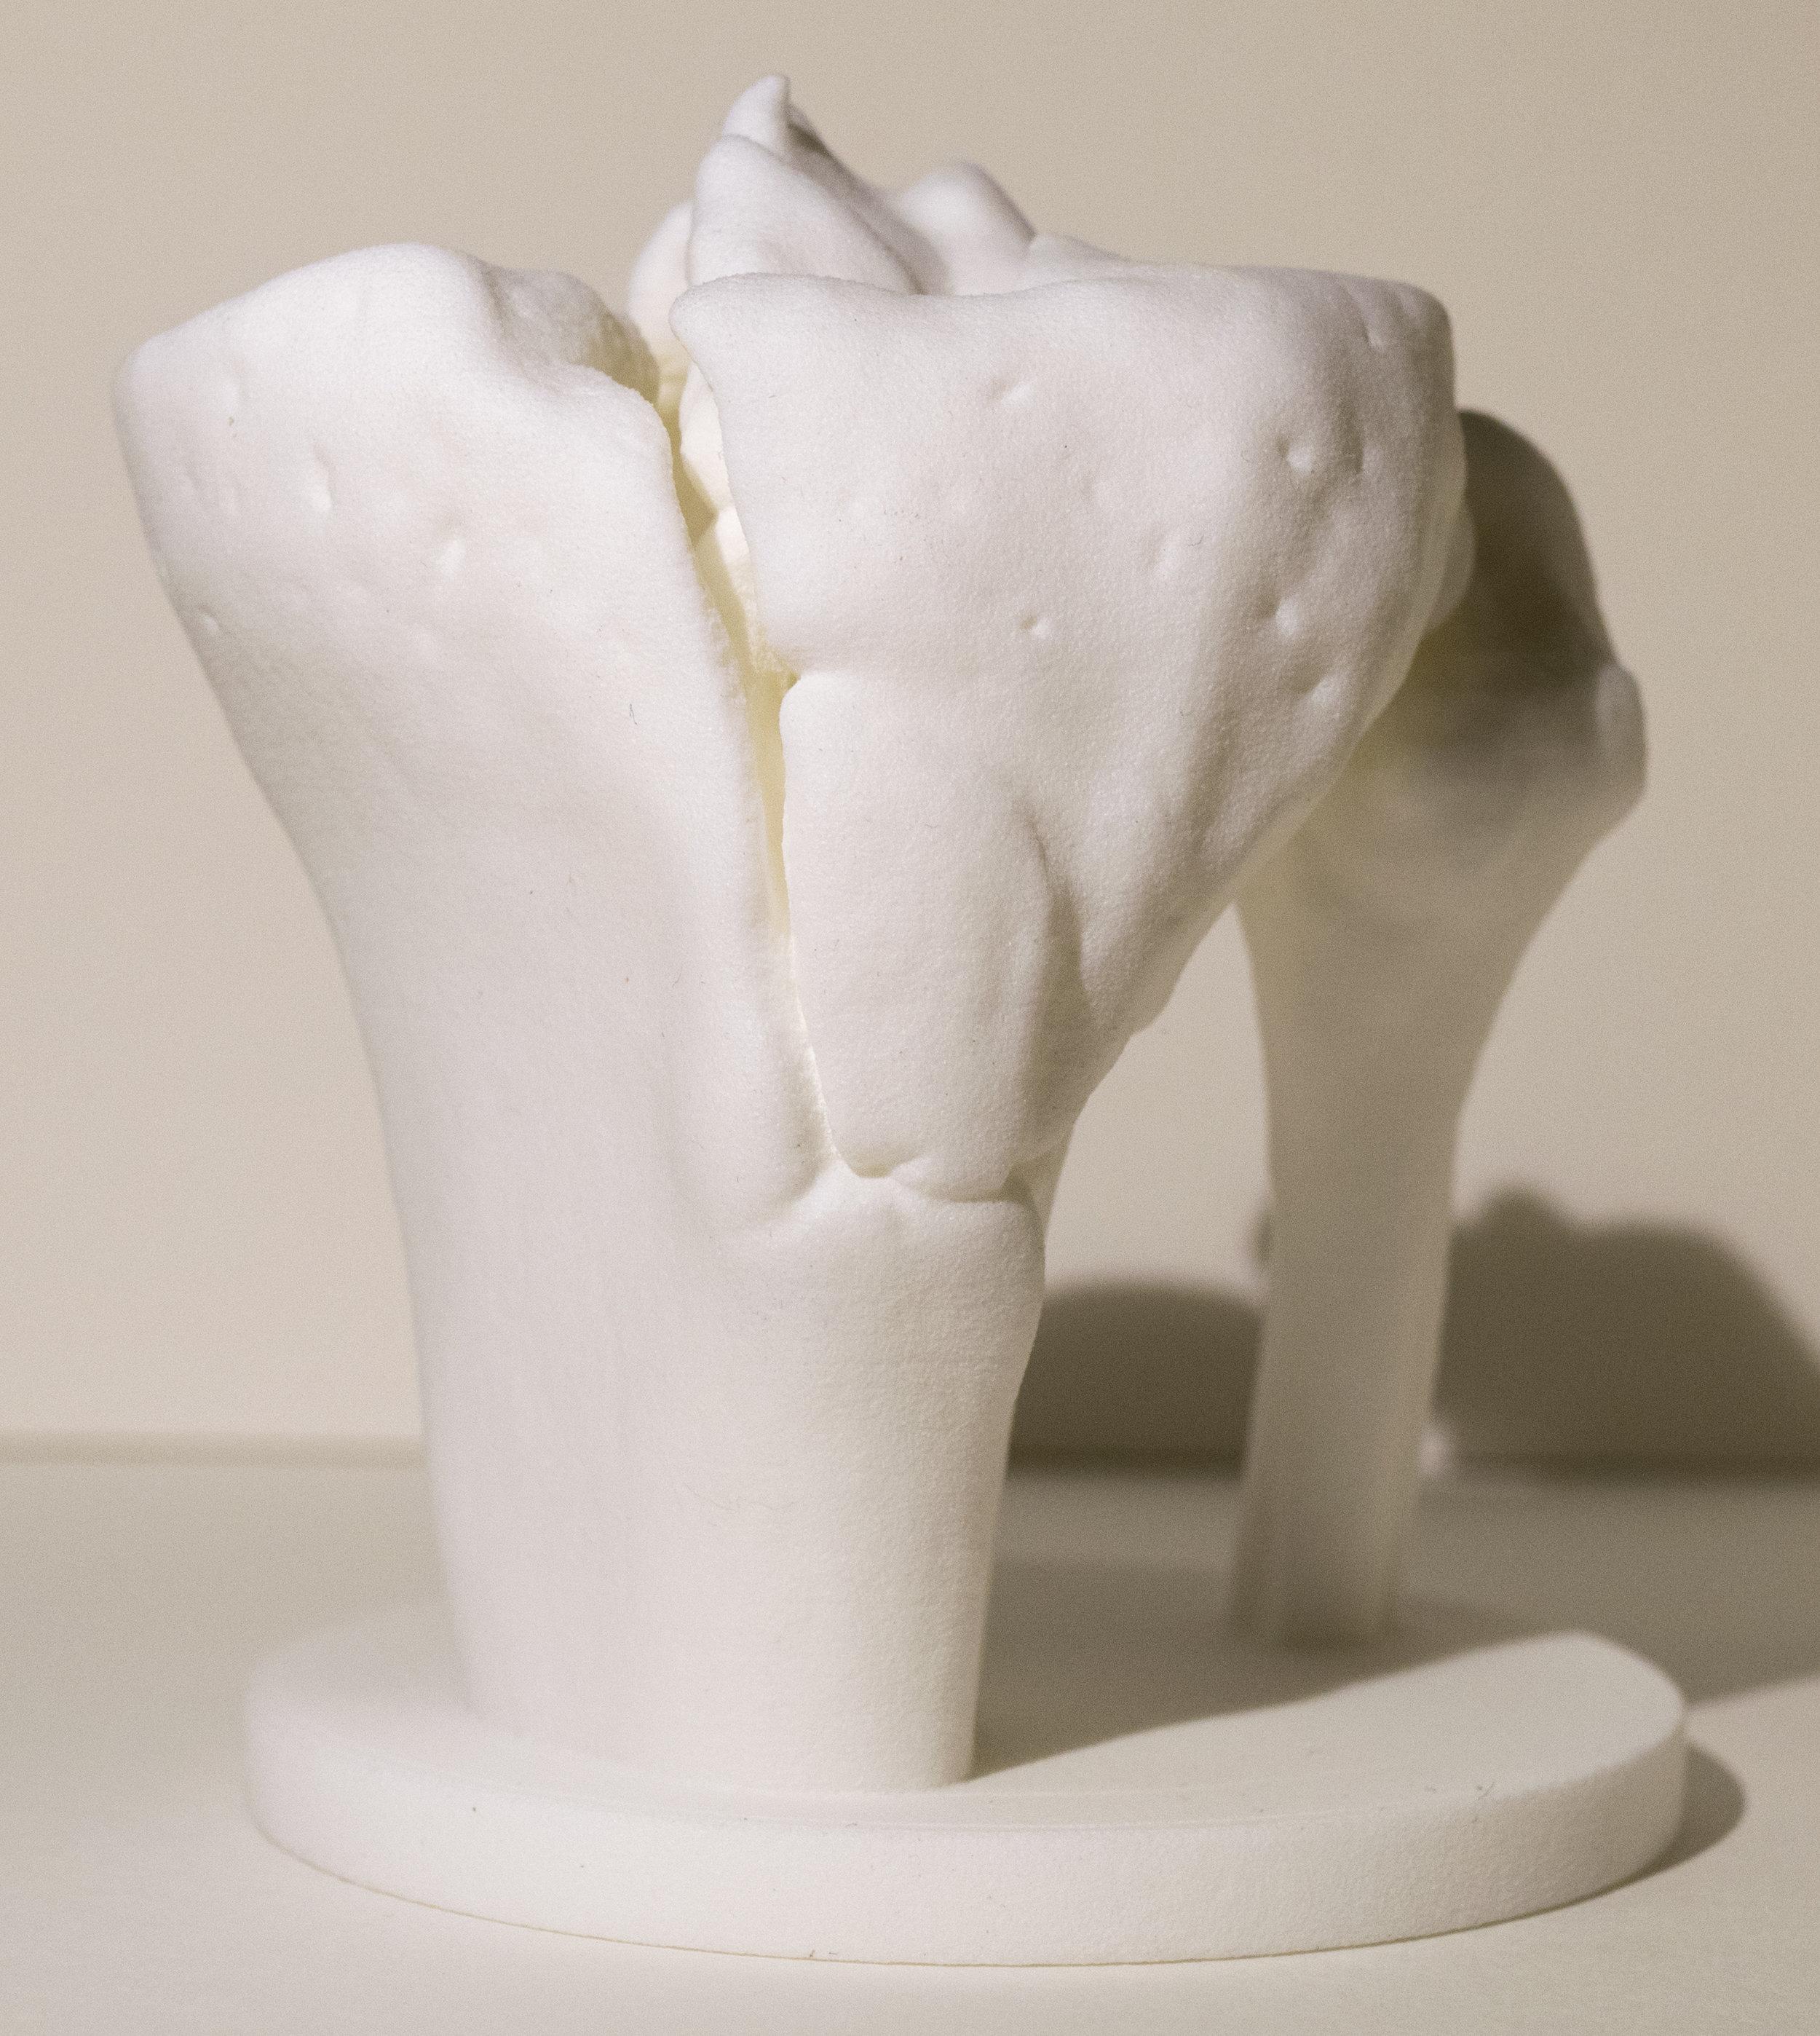 3D Print, Front